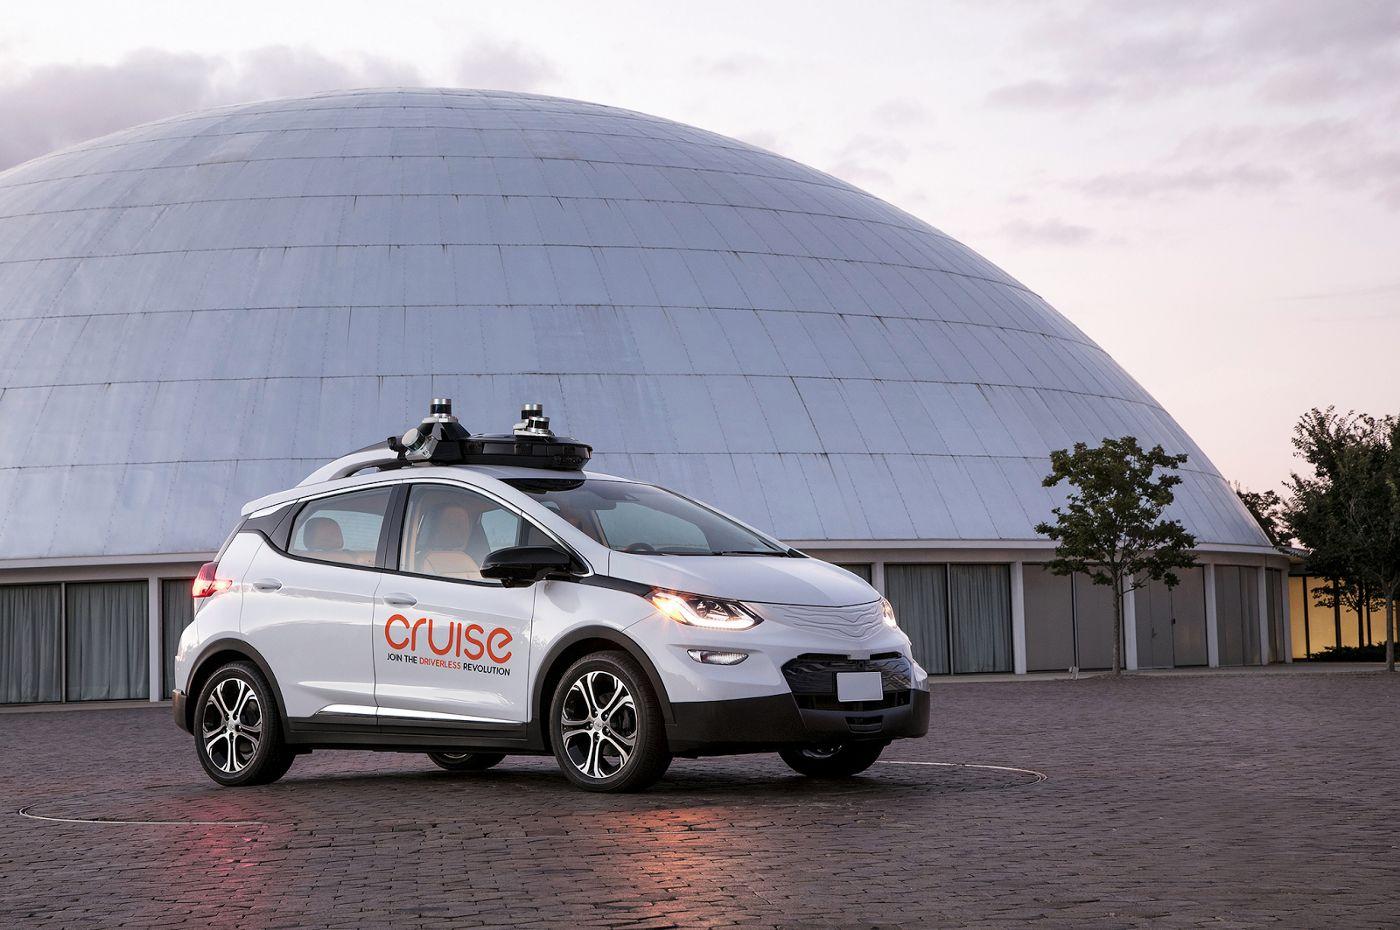 "Cruise Automation: GM-Tochter präsentiert ""erstes autonomes Serienauto"" - Cruise Automation will ein serienreifes autonomes Auto entwickelt haben. (Bild: Cruise Automation)"